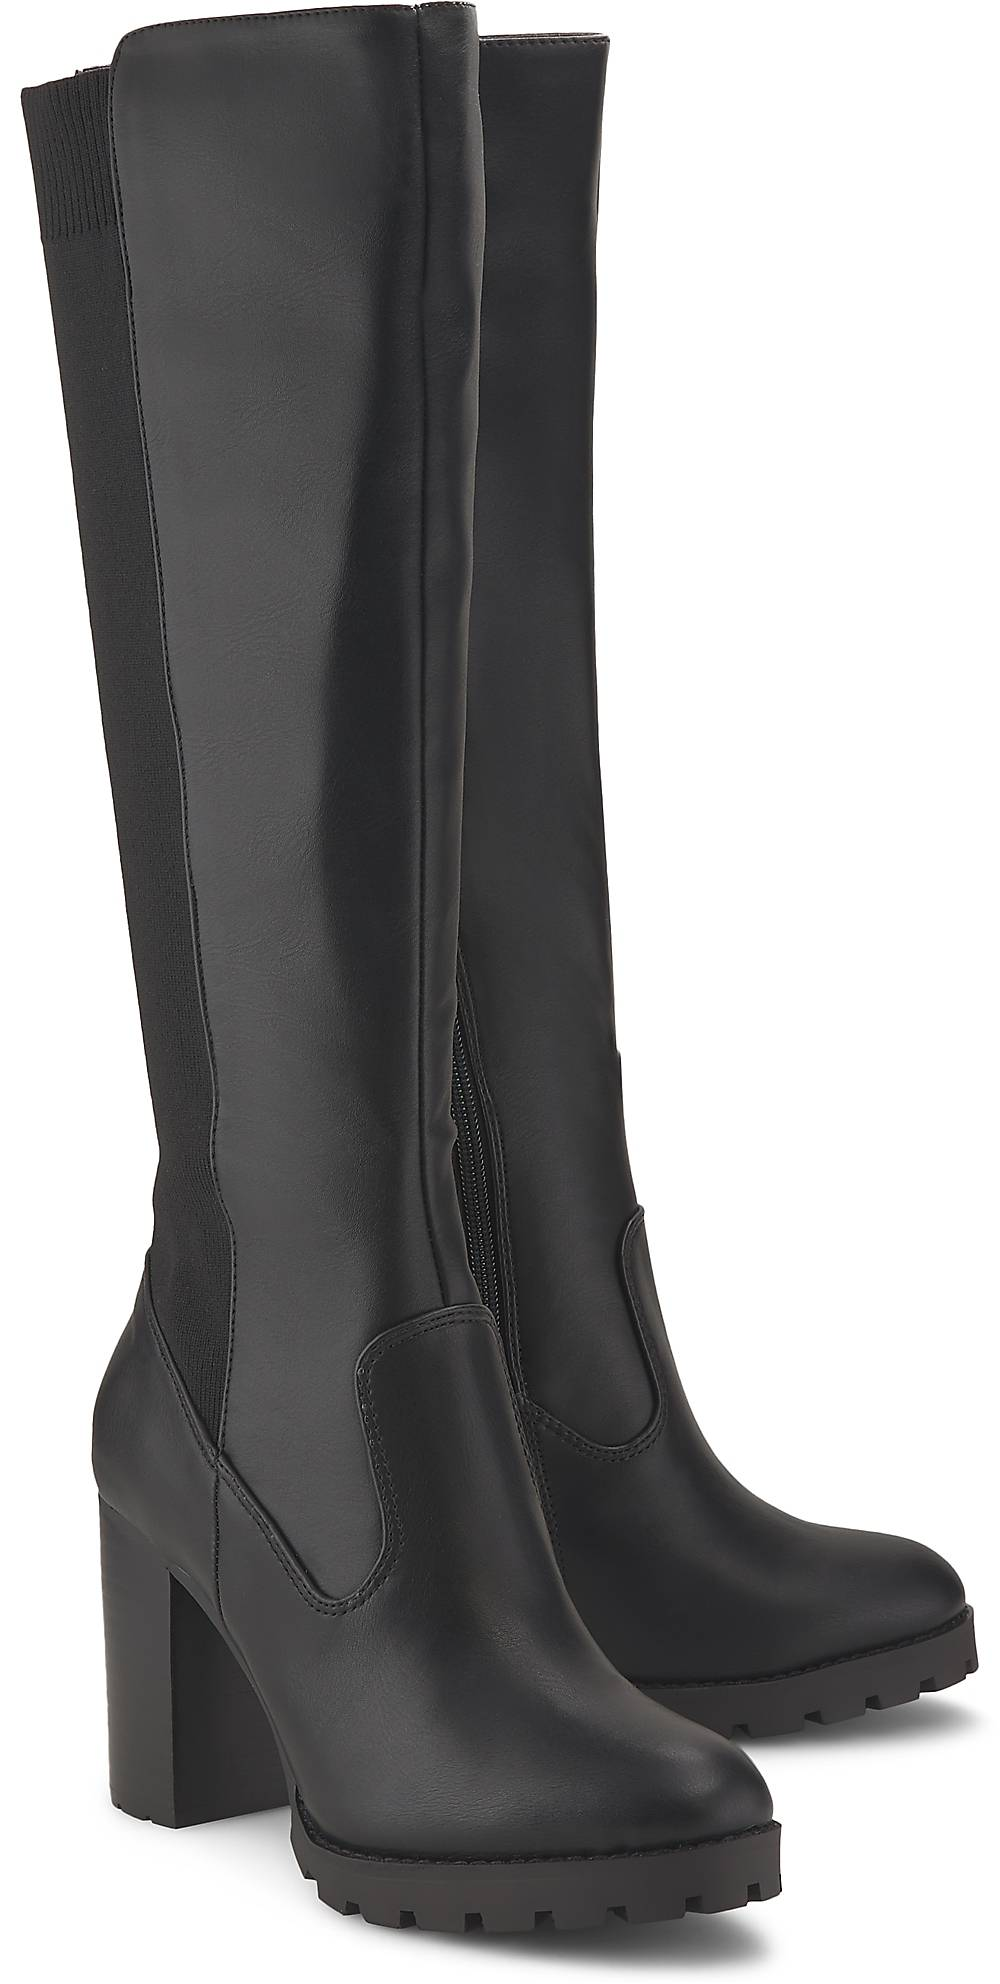 Buffalo| Plateau-Stiefel Felicita in schwarz| Stiefel für Damen | Schuhe > Stiefel > Plateaustiefel | Buffalo